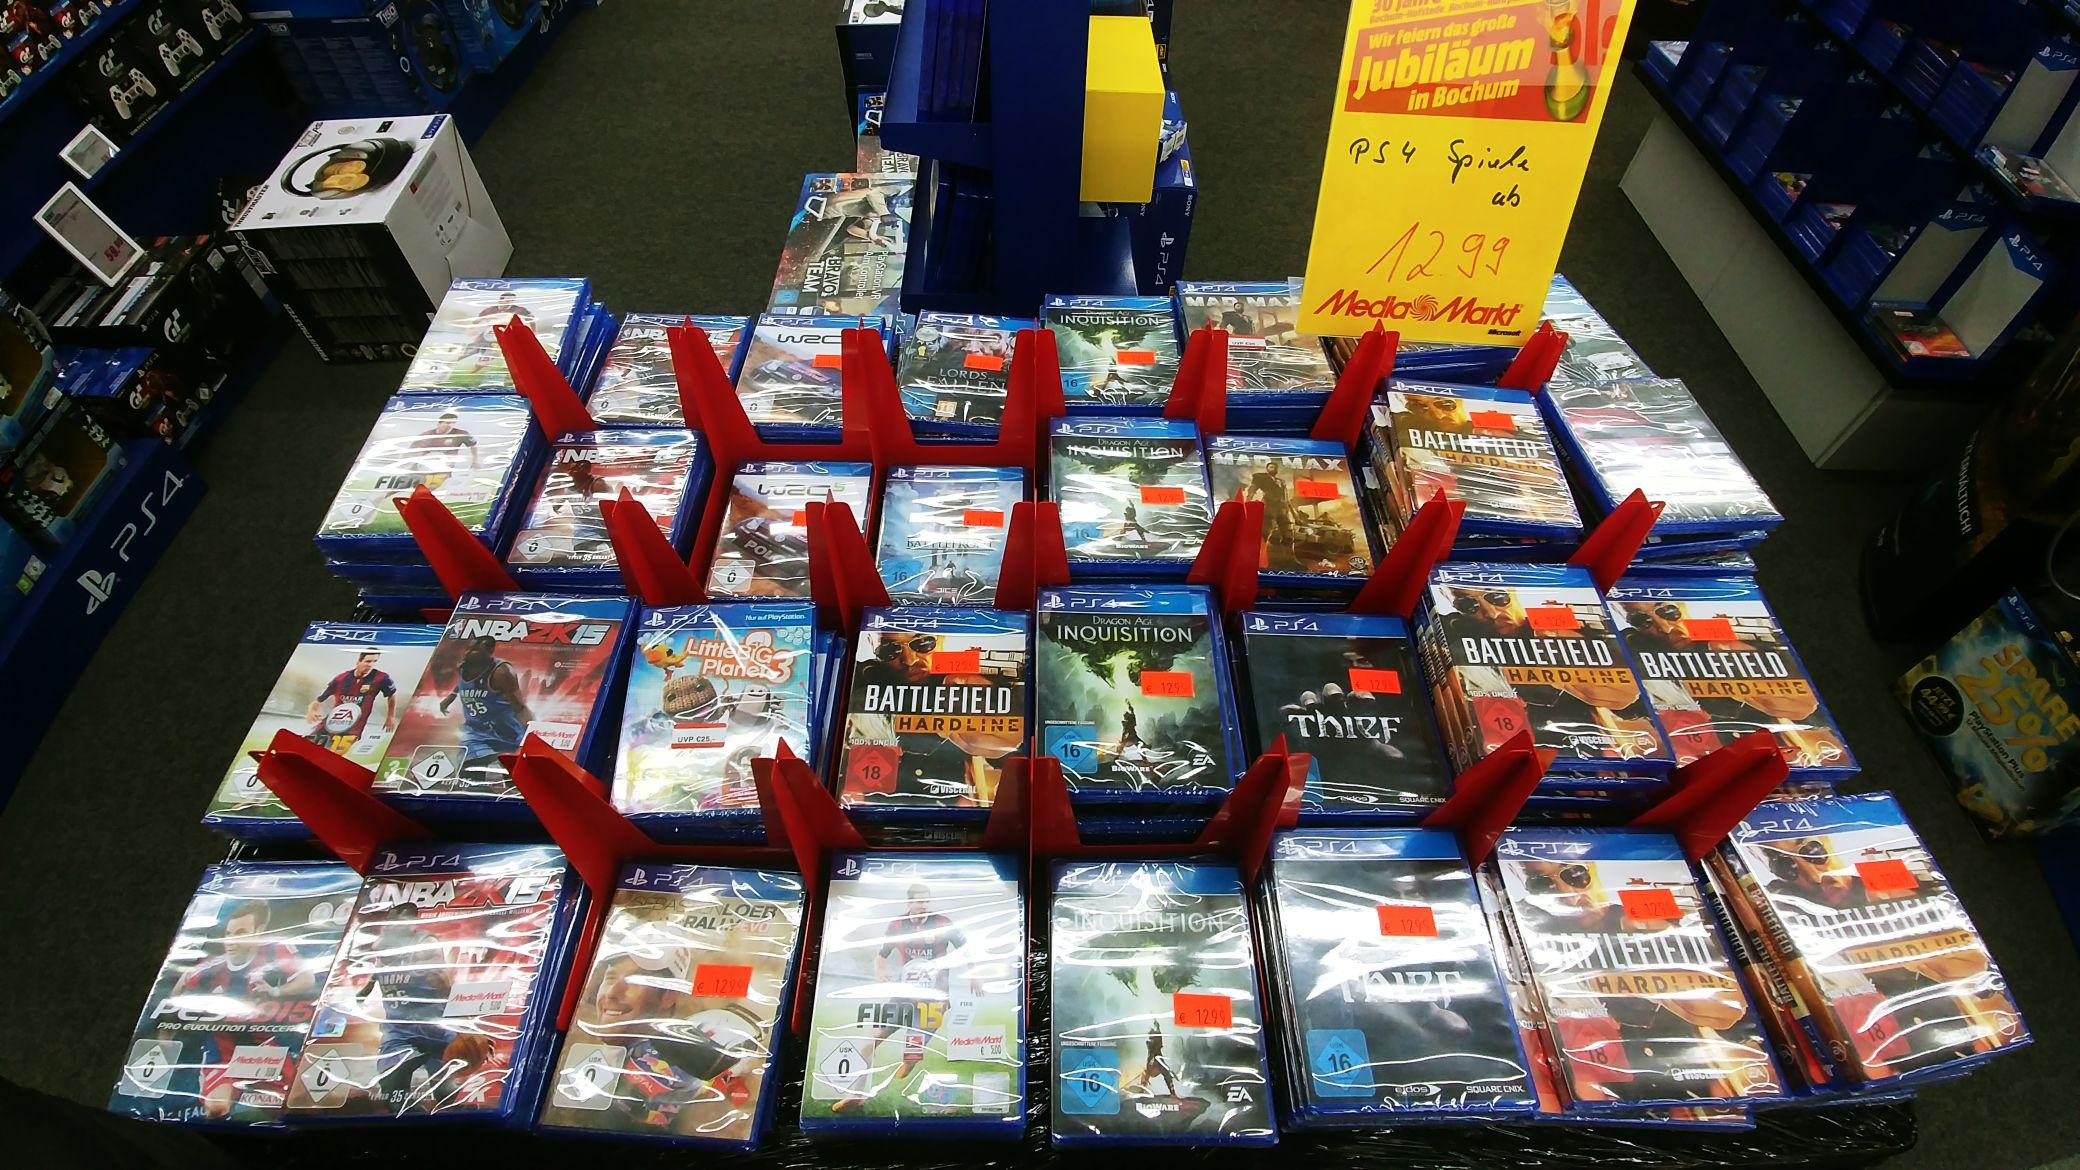 PS4 Spiele - MediaMarkt Bochum Ruhrpark (LOKAL Bochum)